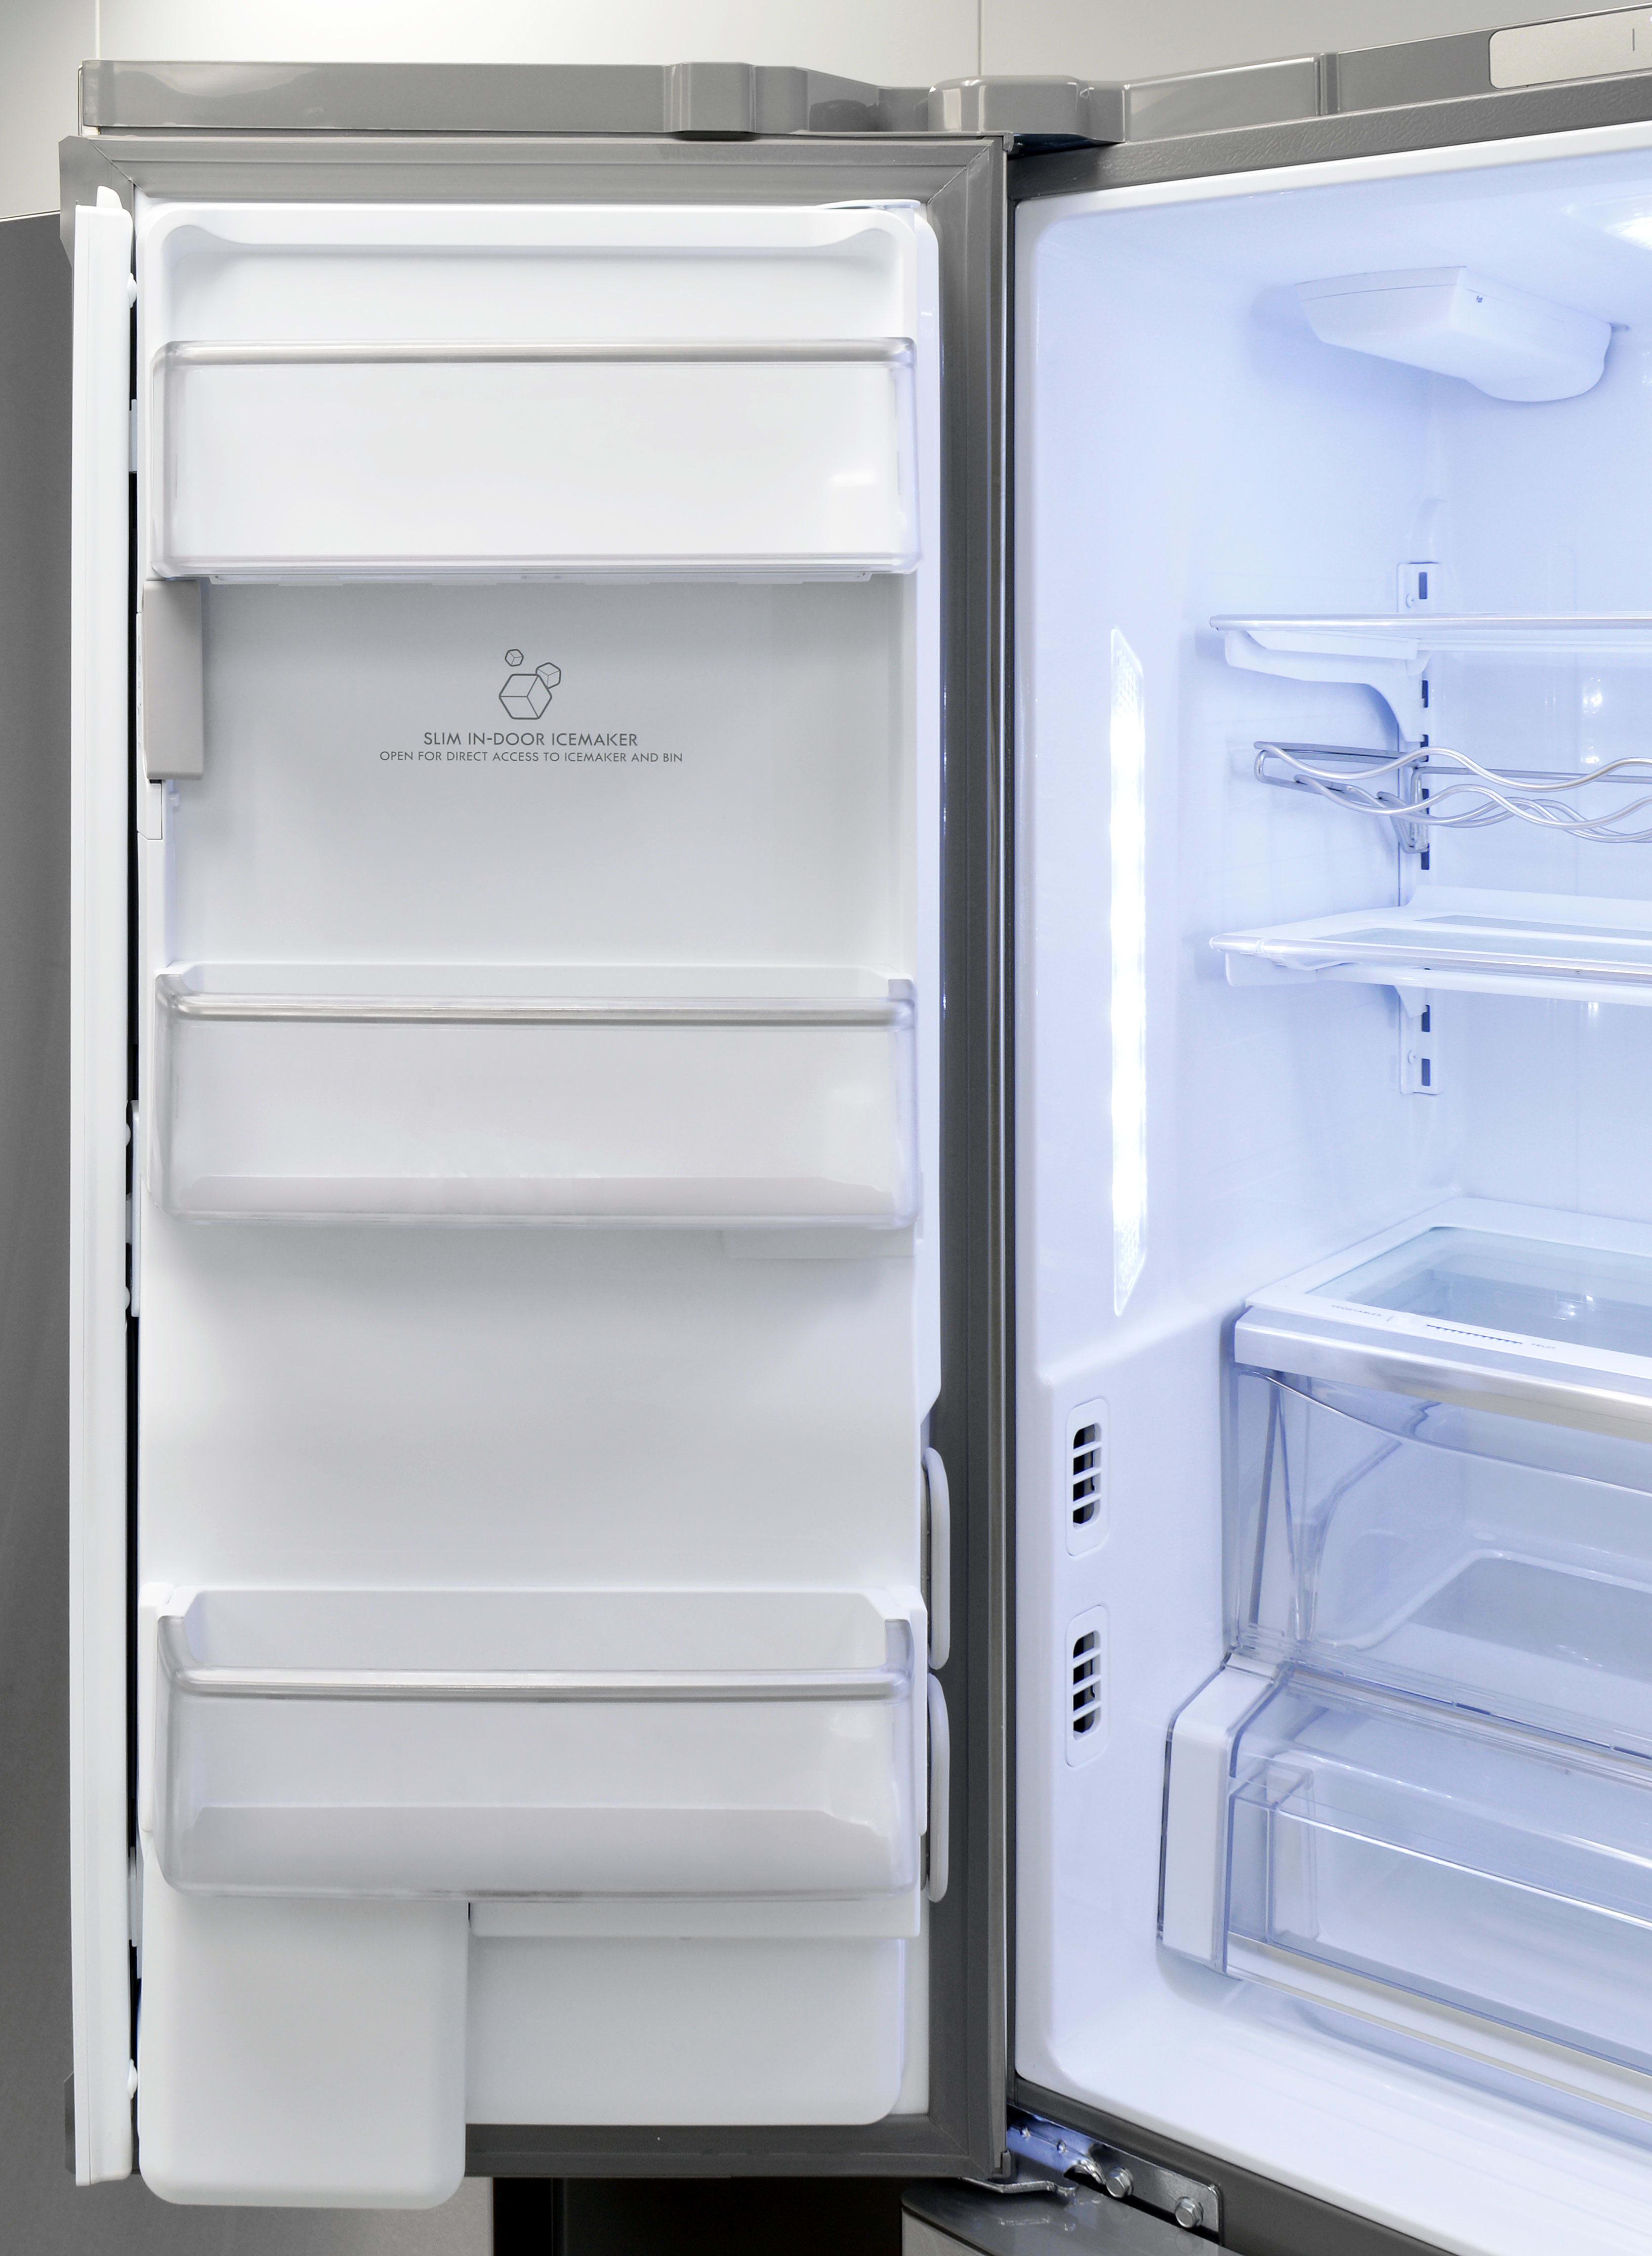 interesting fresh single in undercounter refrigerator ideas freezer of drawers drawer